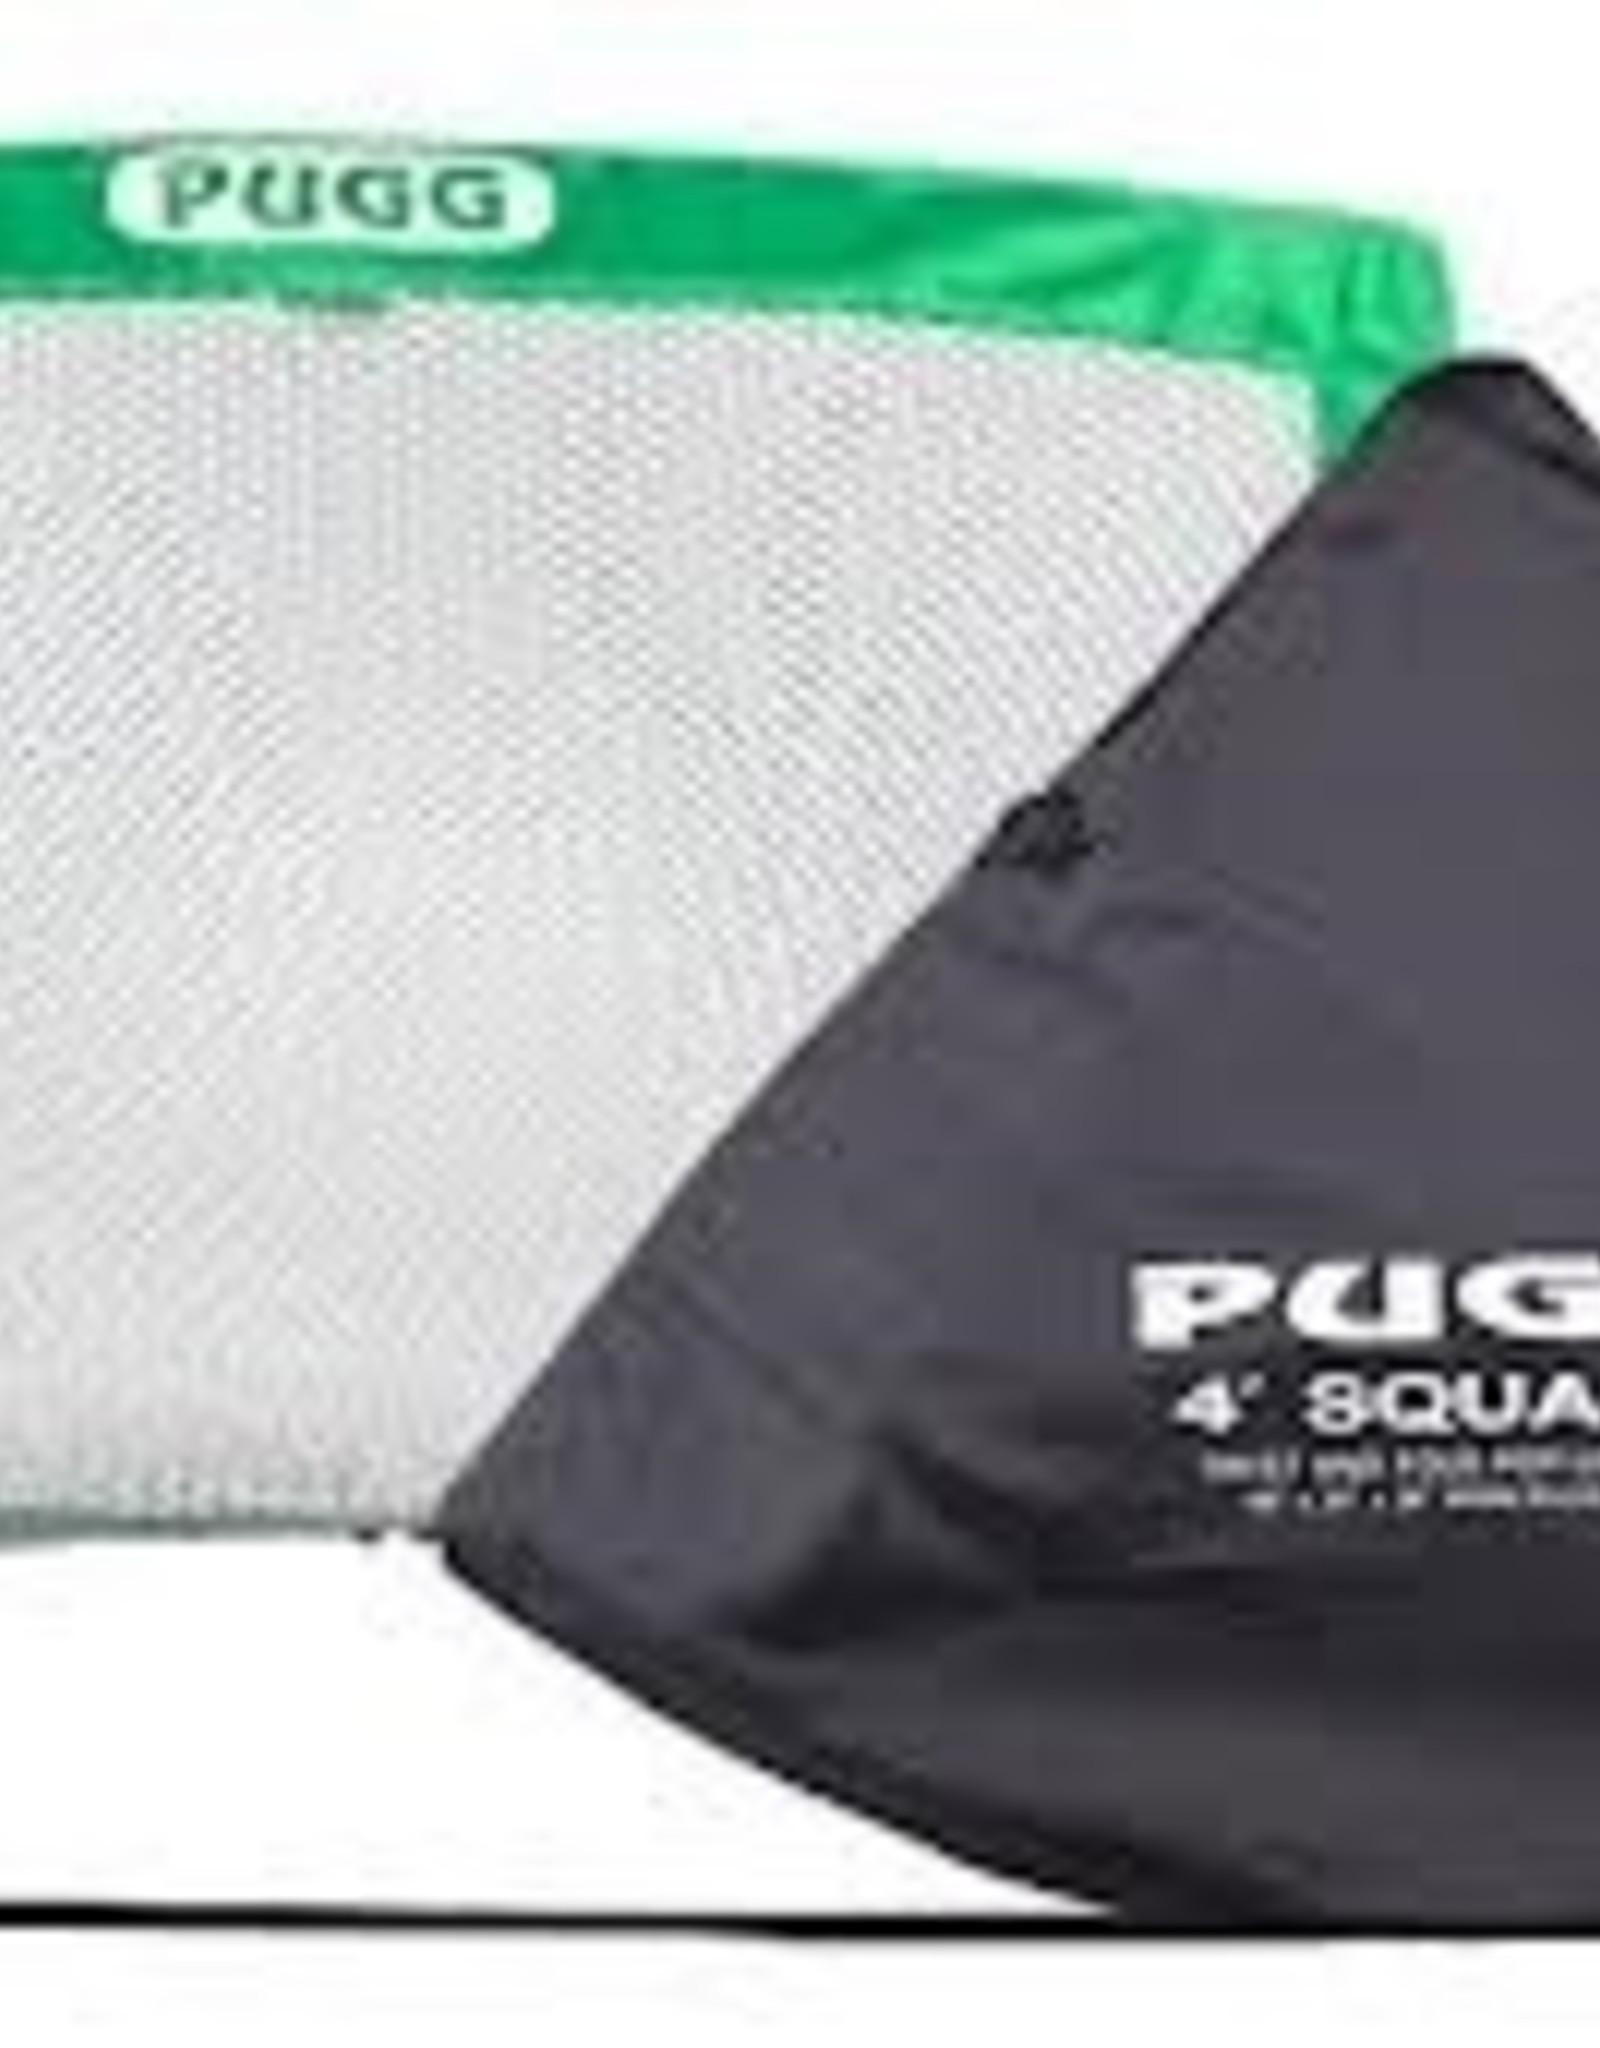 Pugg Pugg 4' Square Goal